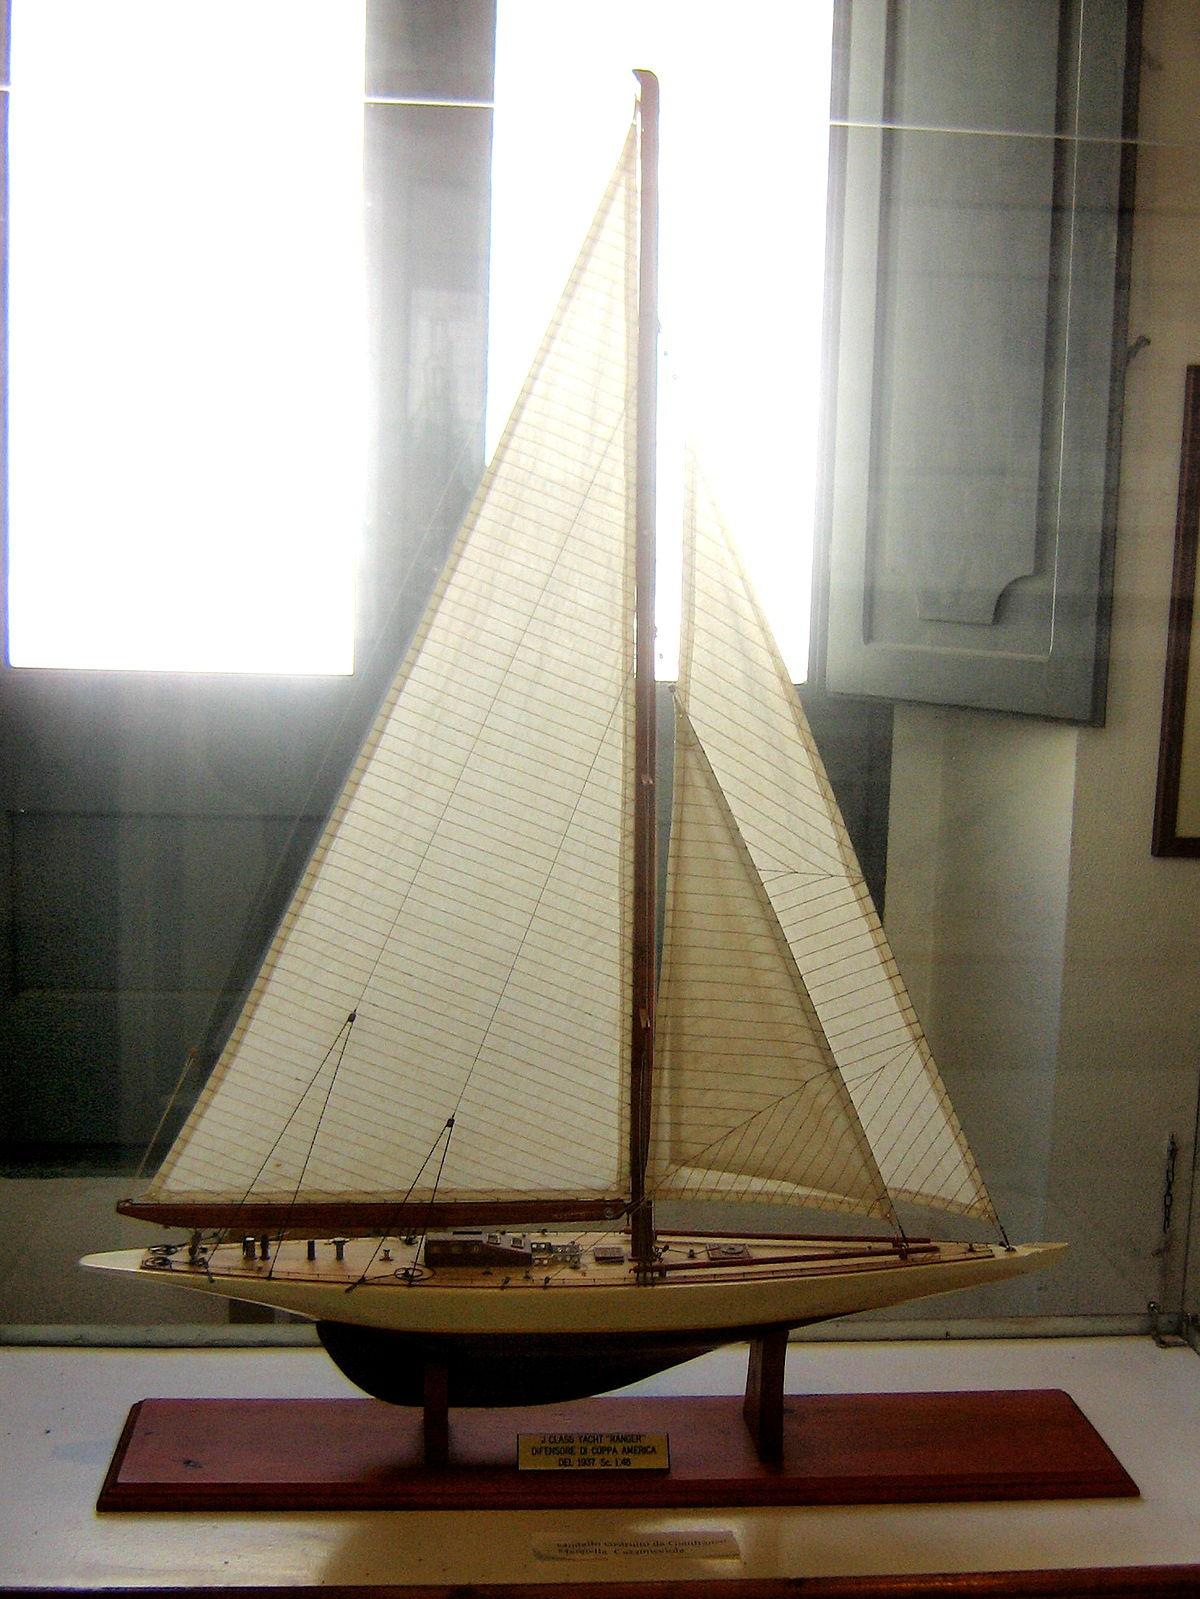 Ranger (yacht) - Wikipedia